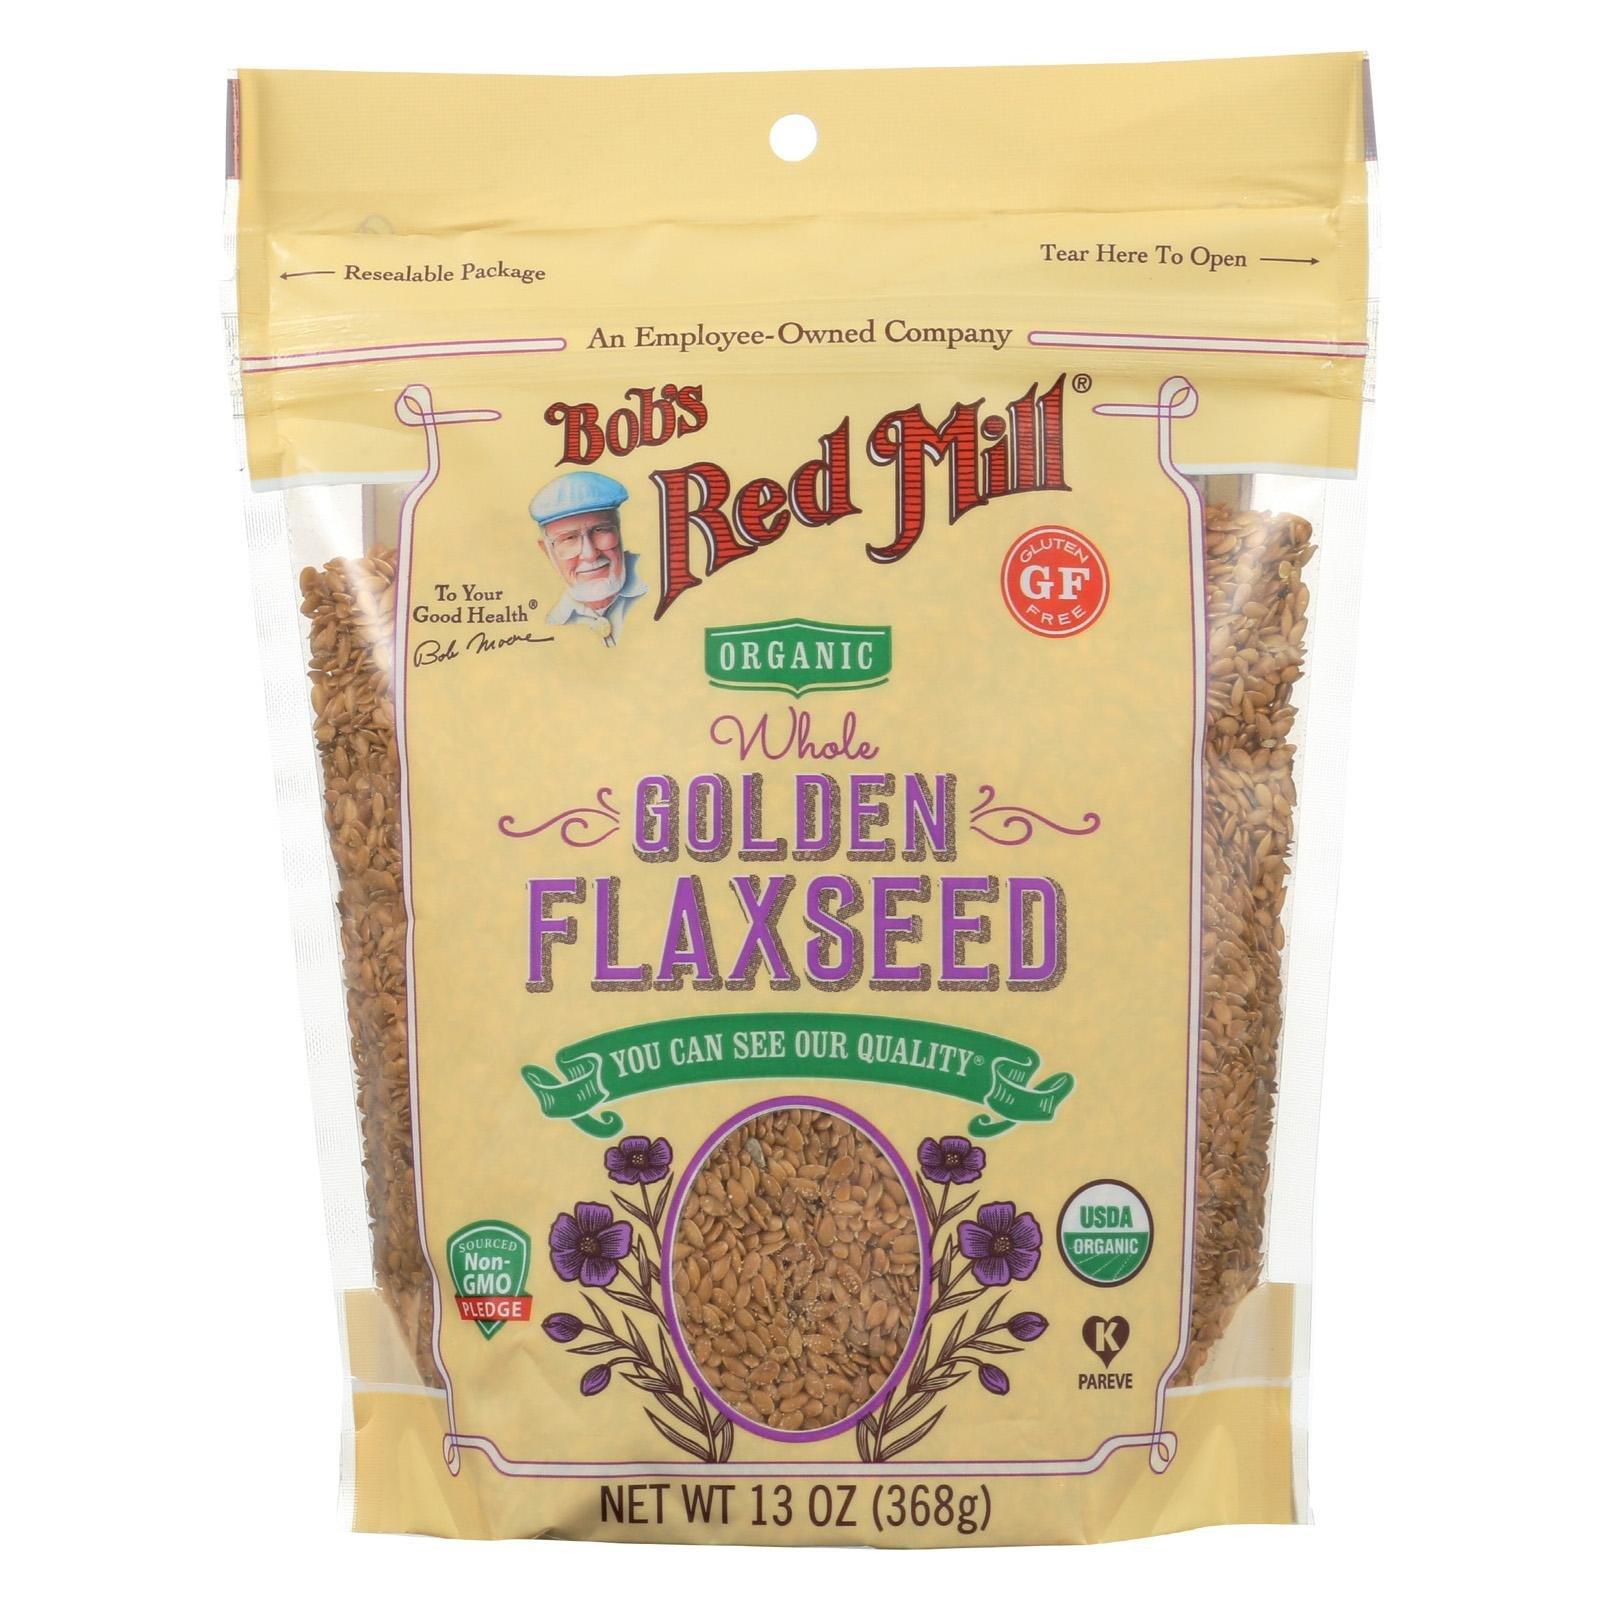 BOB'S RED MILL, Organic Flaxseed, Golden, Pack of 6, Size 13 OZ, (Gluten Free Kosher 95%+ Organic)